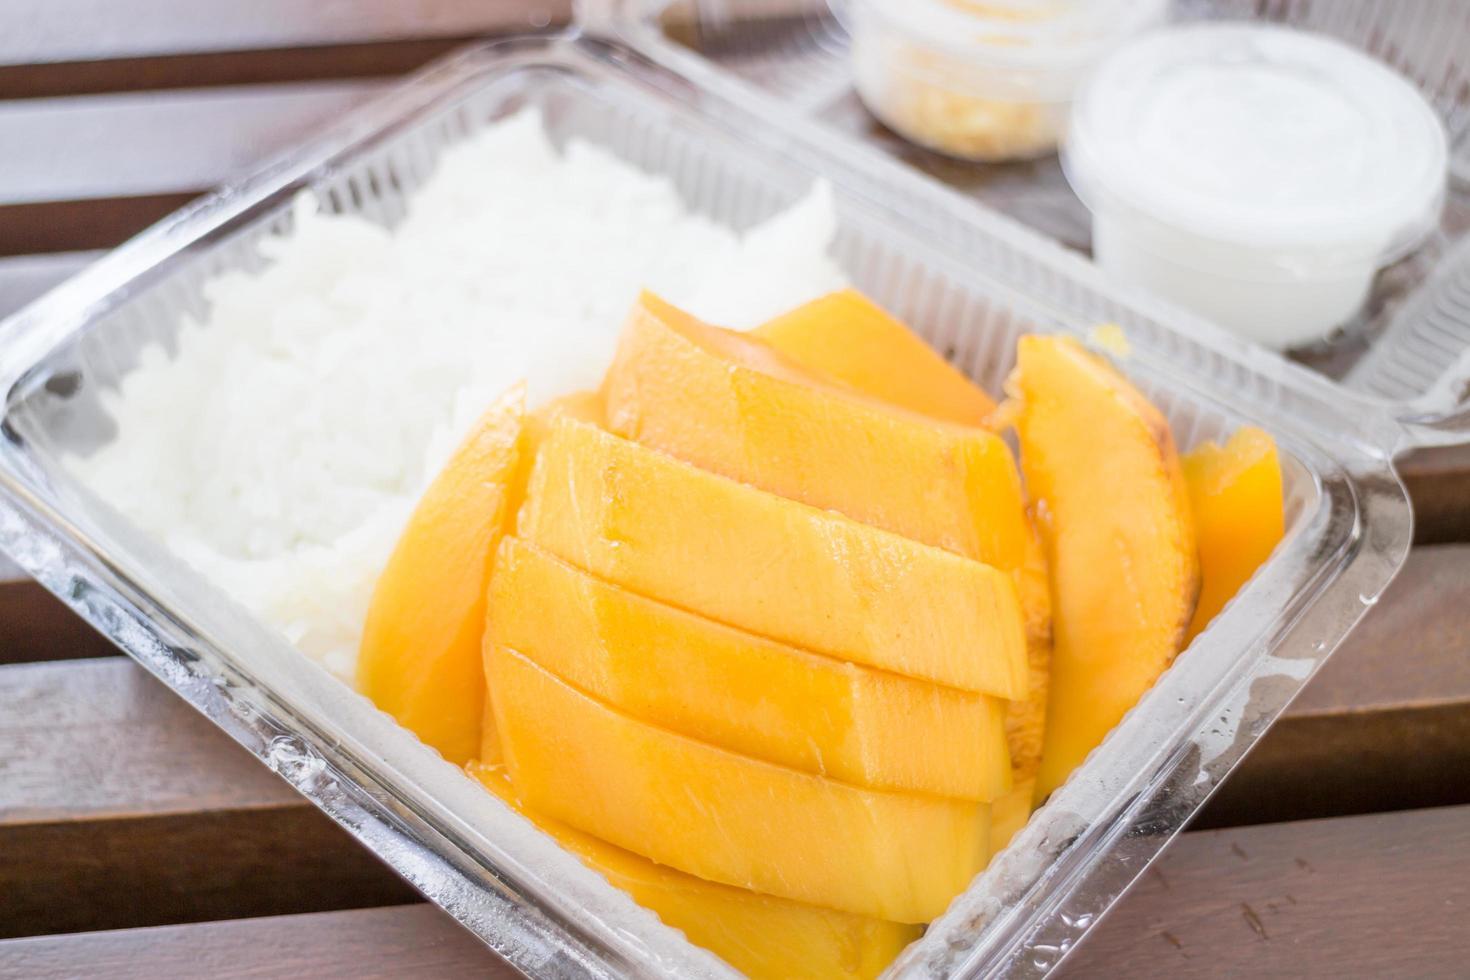 Mango and sticky rice photo